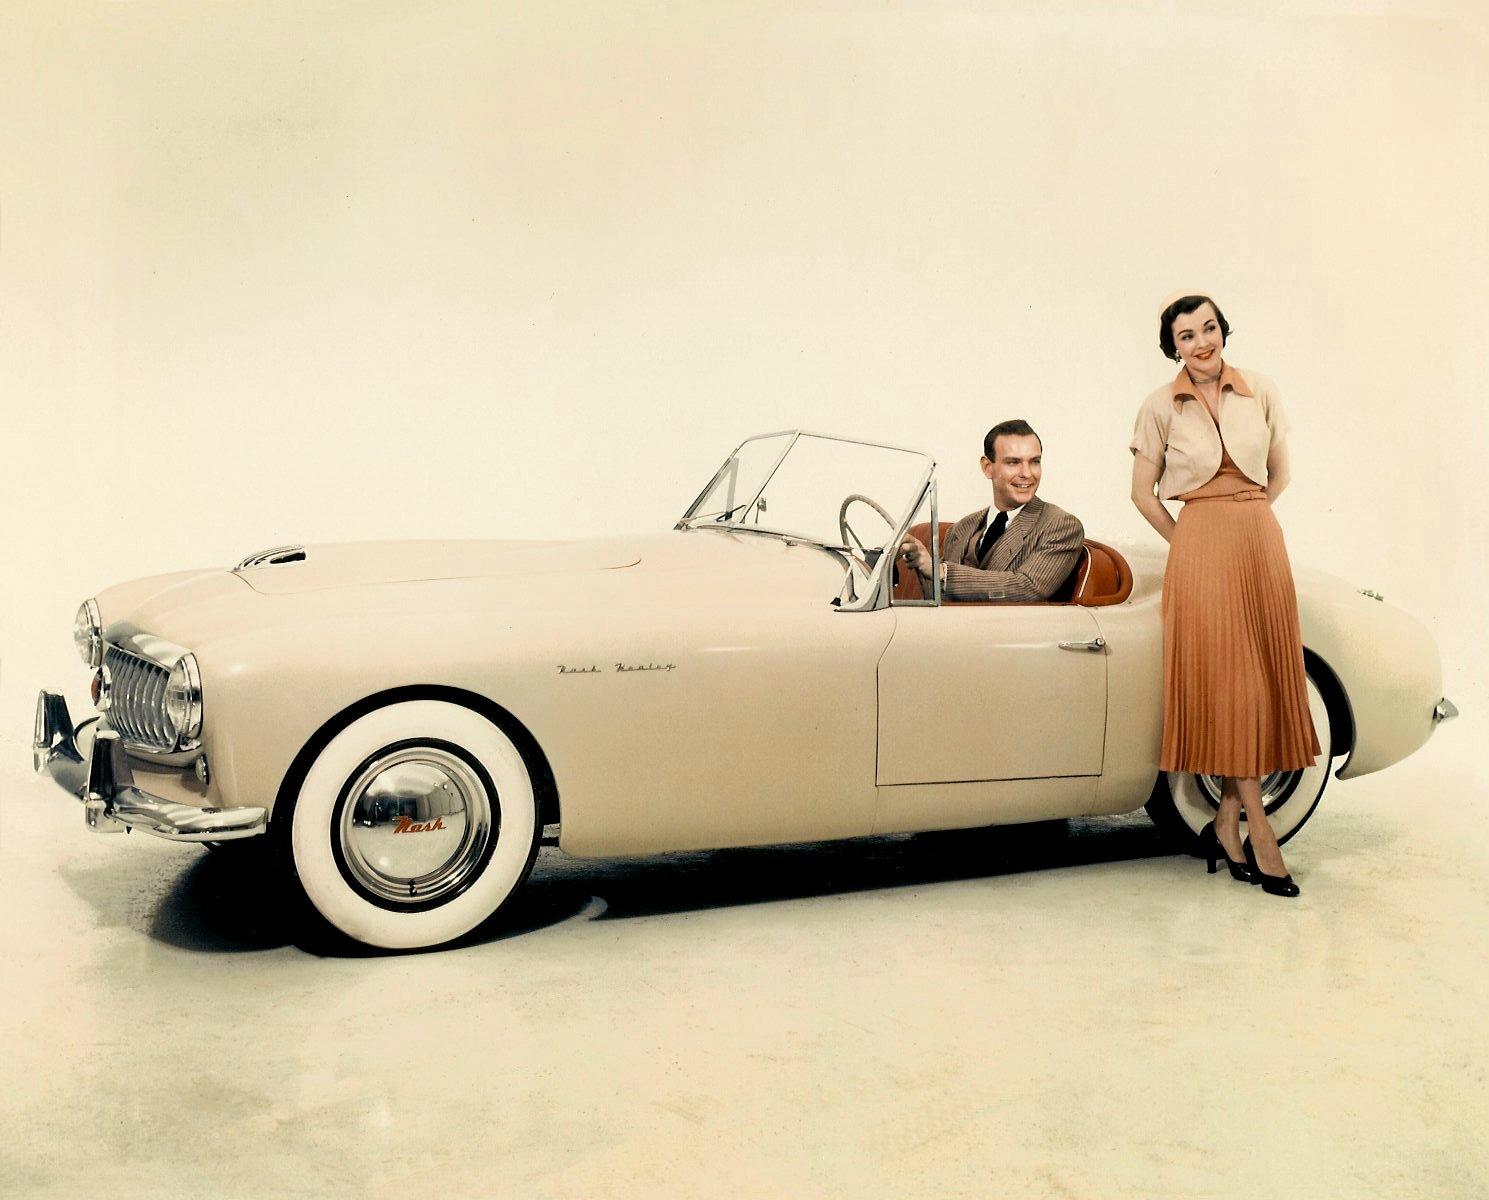 1951 NASH Healey 10″x8″ Color photograph